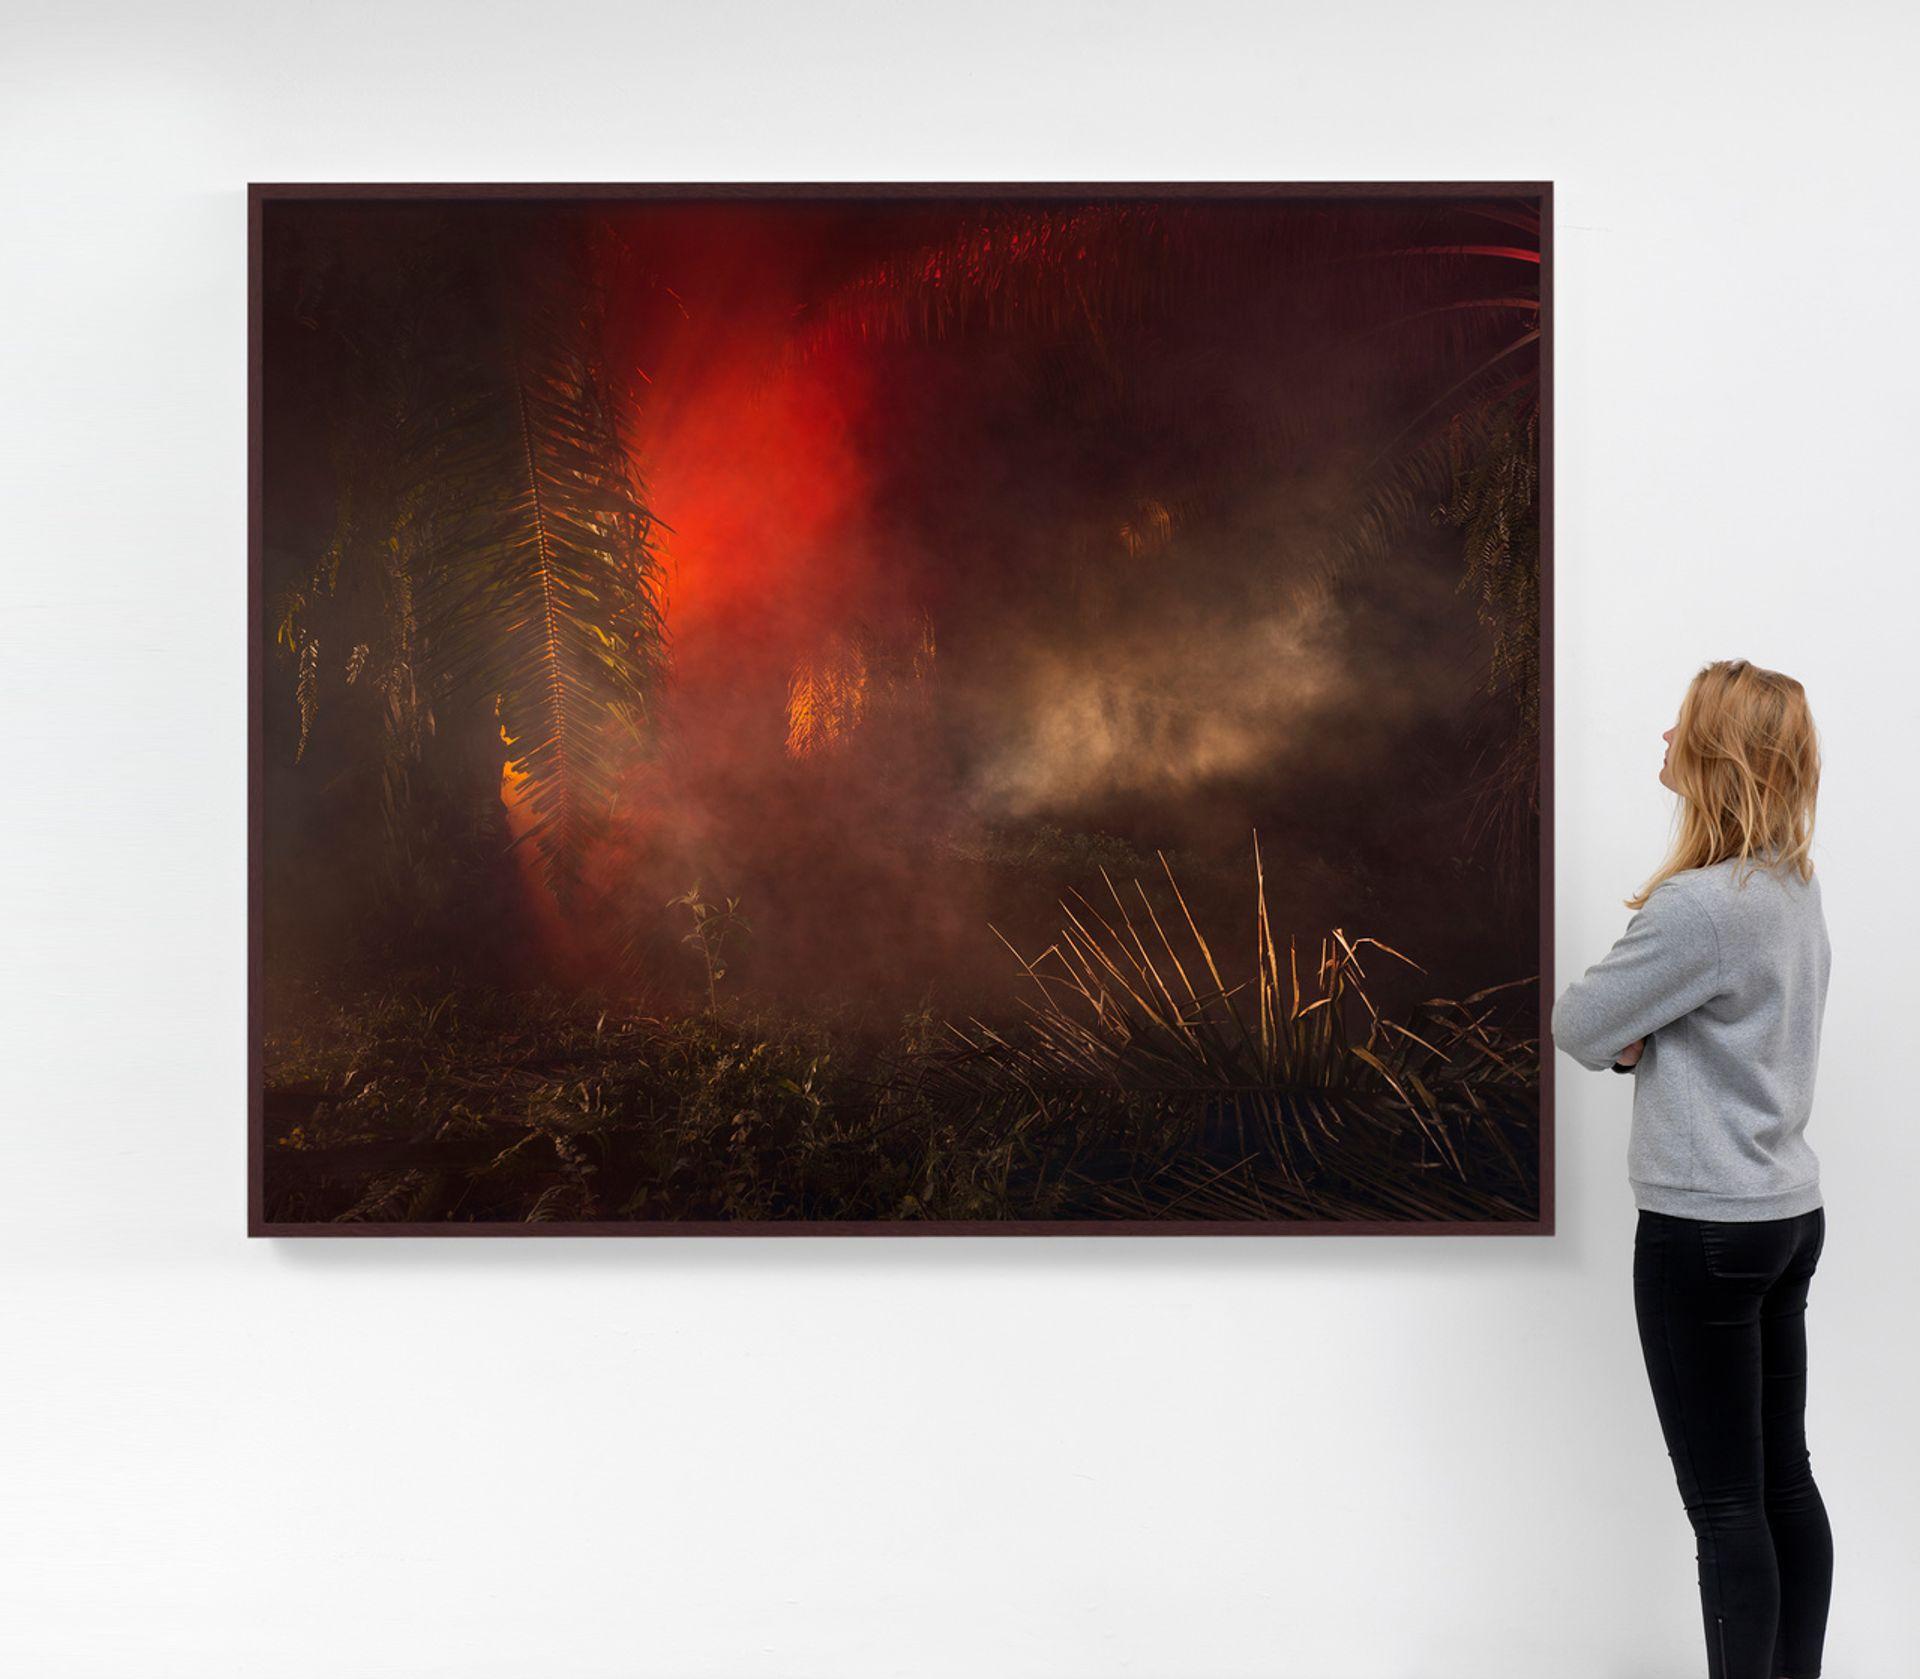 Julian Charrière, An Invitation to Disappear- Kinabatangan (2018) Courtesy of Dittrich & Schlechtriem, Berlin; Sies + Höke, Düsseldorf